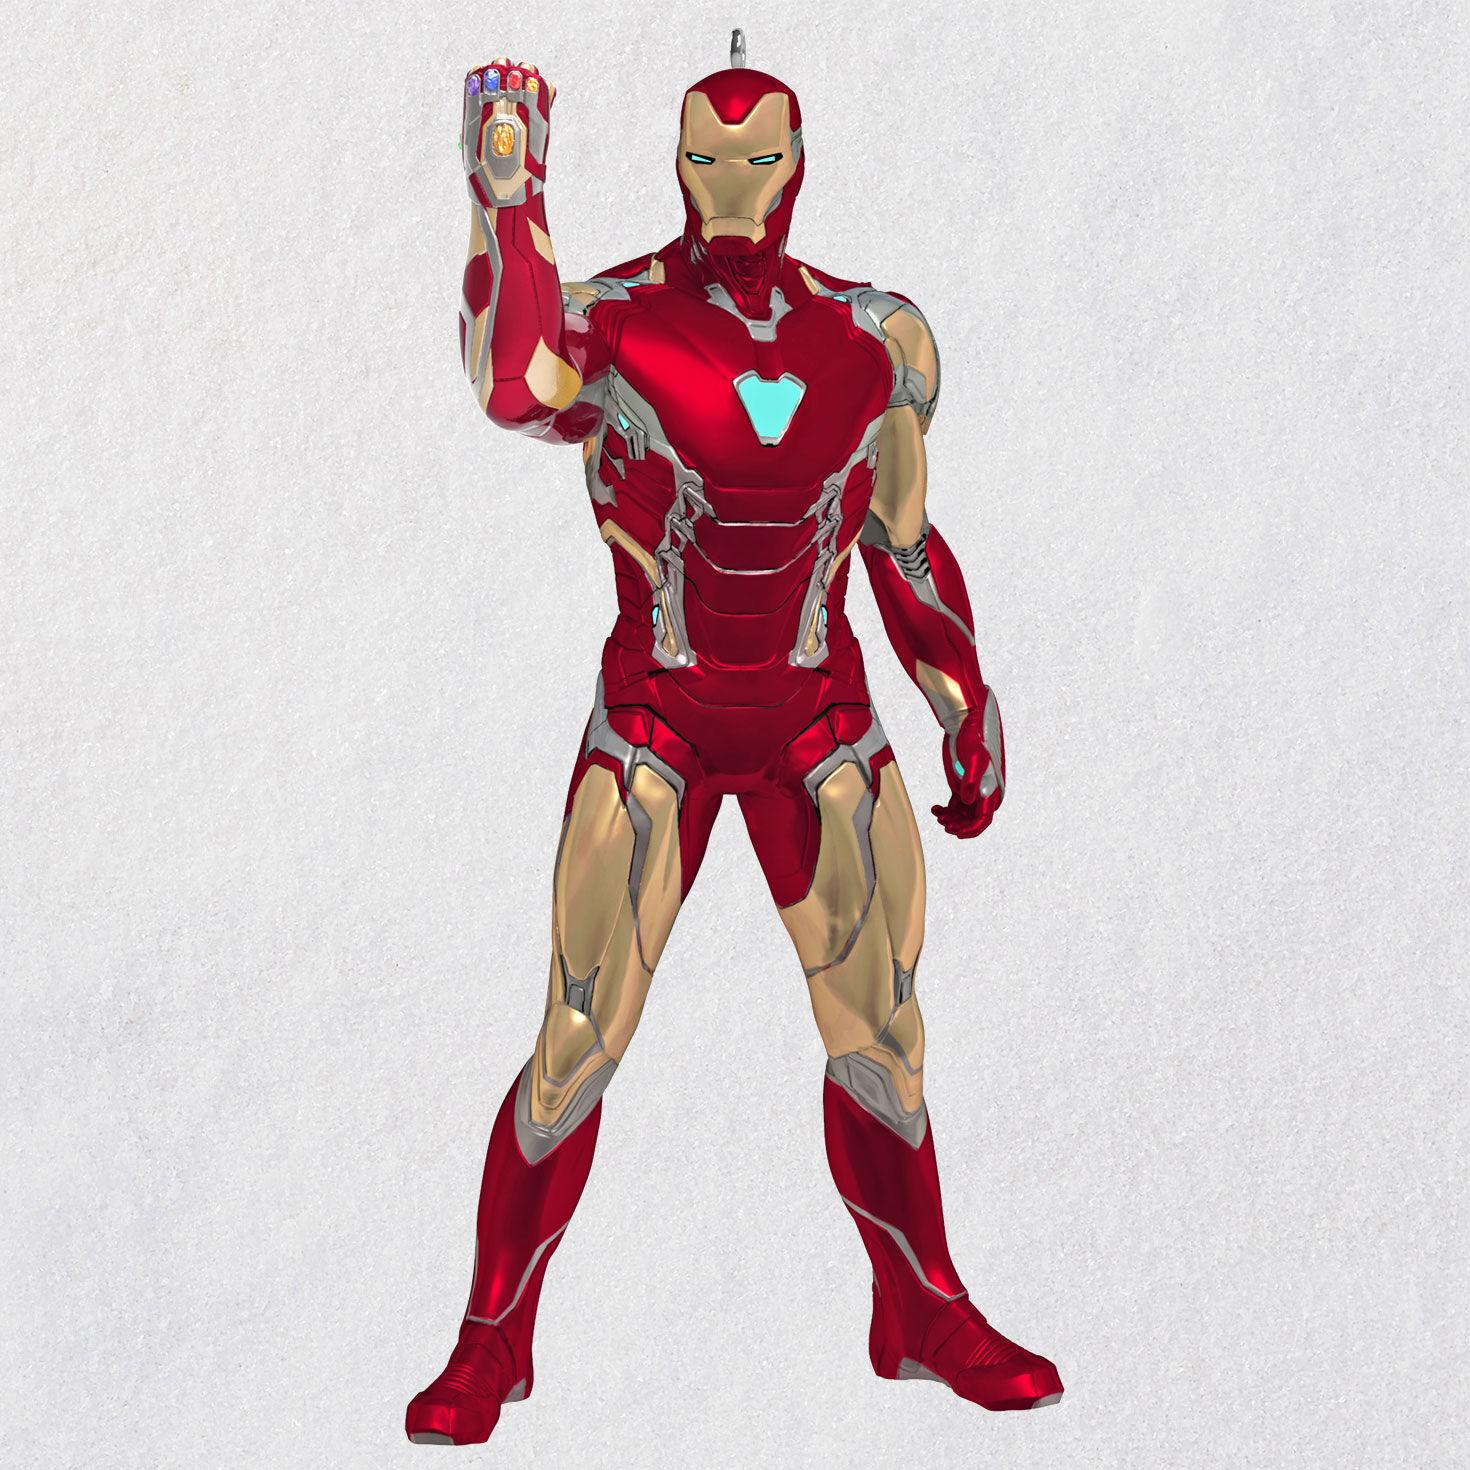 Marvel Avengers Metal Ornament 2019 Hallmark Ornament IRON MAN New In Box